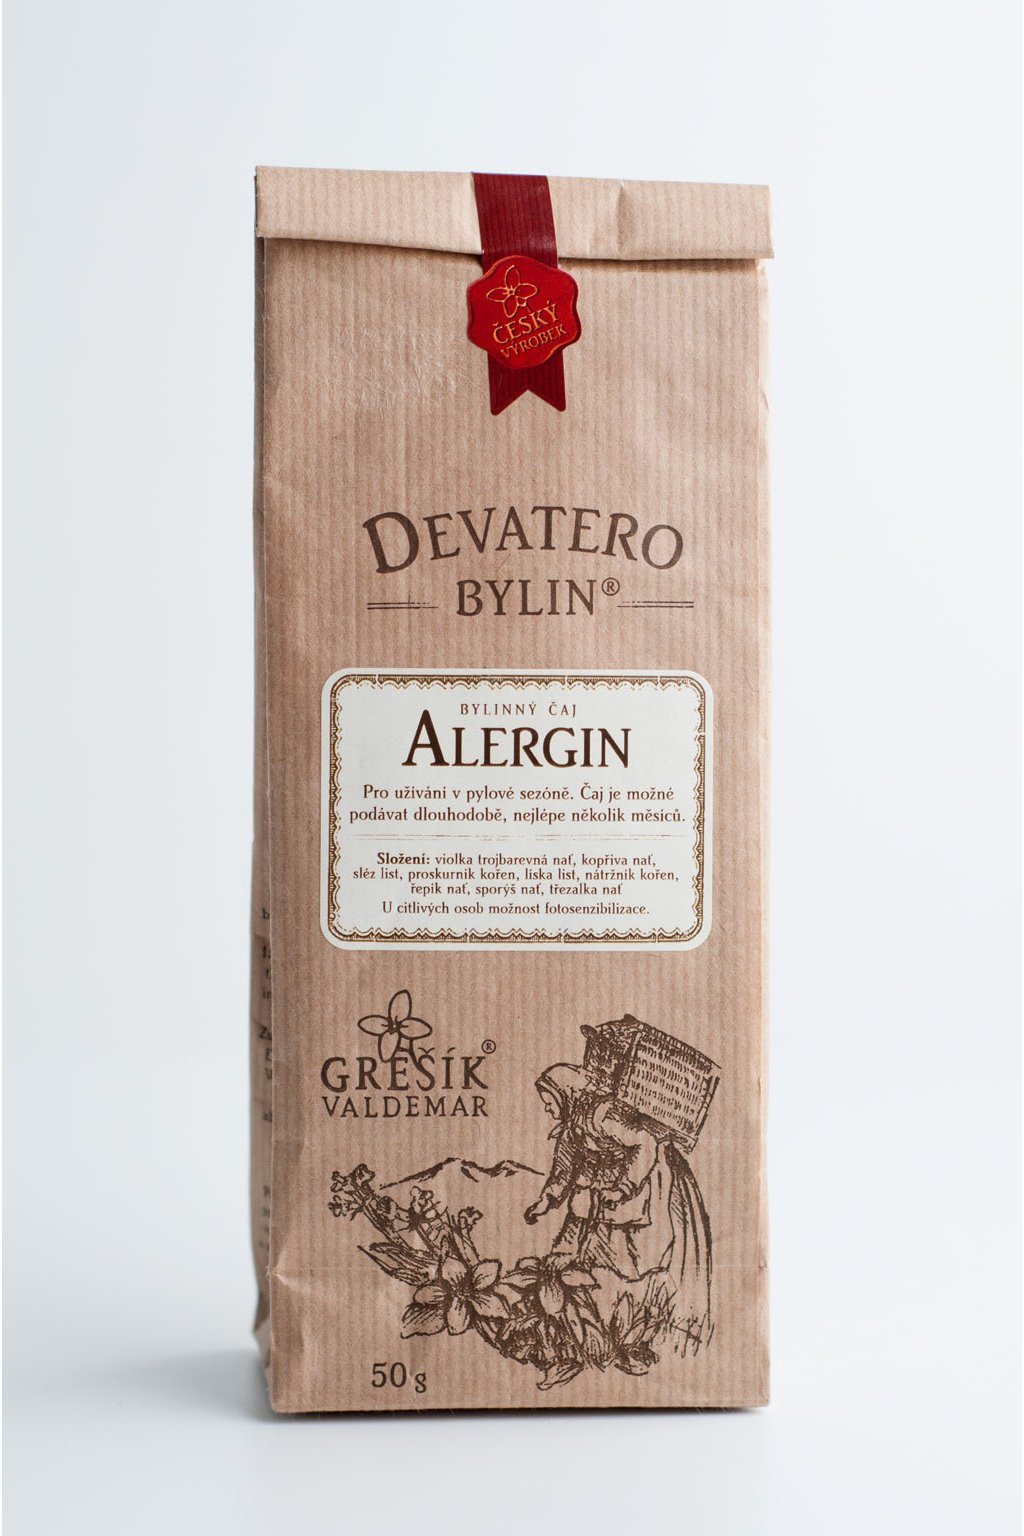 Alergin - 50g